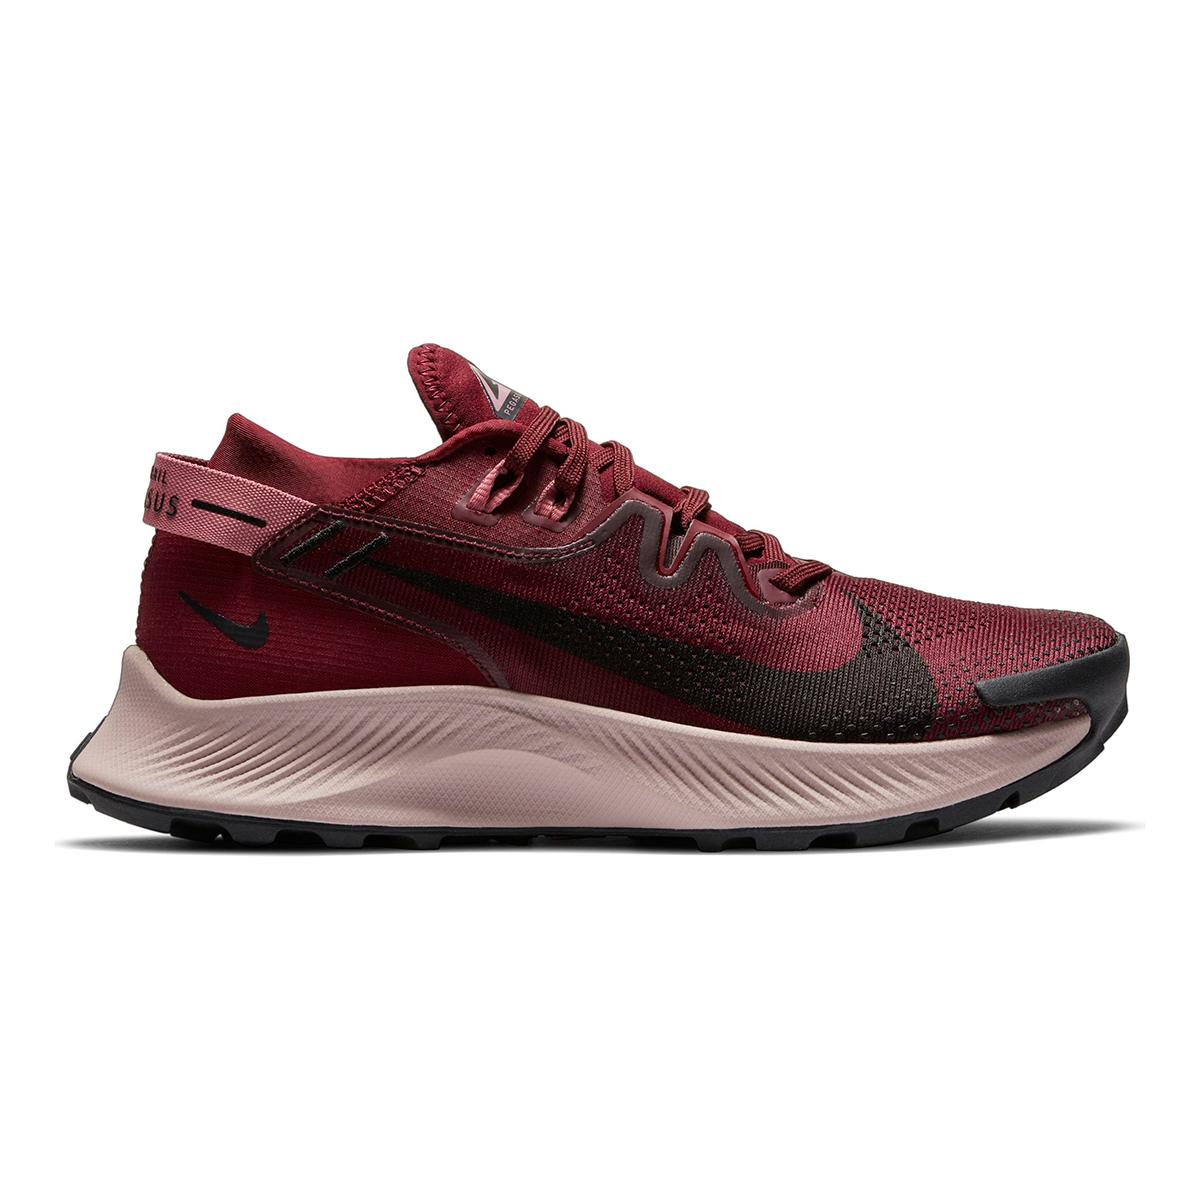 Women's Nike Pegasus Trail 2 Trail Running Shoe - Color: Dark Beetroot/Desert Berry/Platinum Tint/Black - Size: 5 - Width: Regular, Dark Beetroot/Desert Berry/Platinum Tint/Black, large, image 1